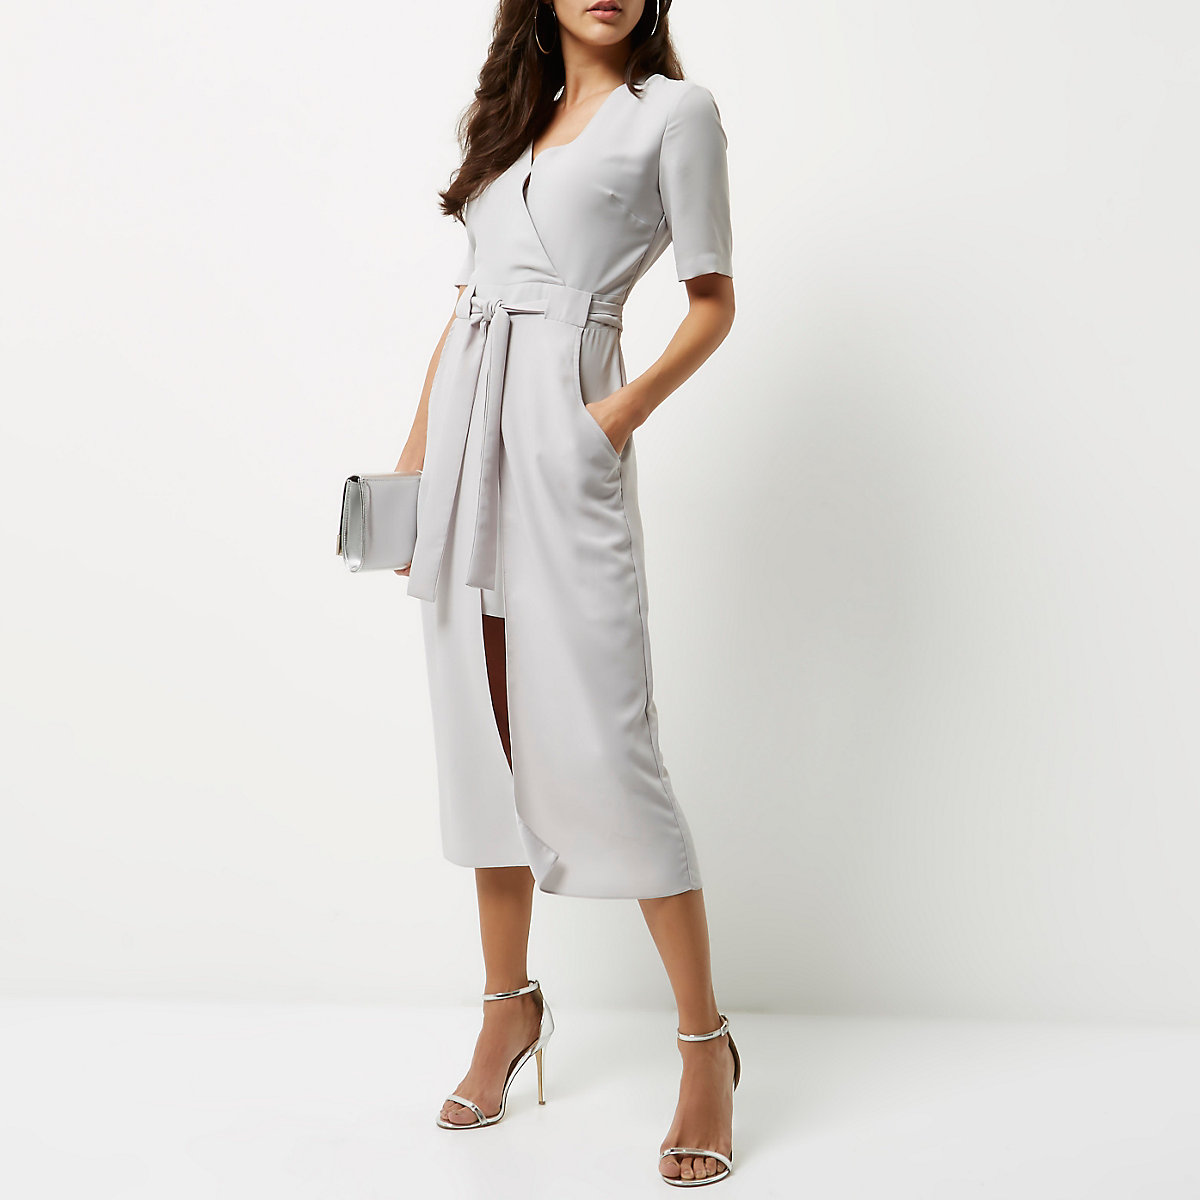 1d98aa99c3131e Lichtgrijze midi-jurk met overslag - Swingjurken - Jurken - Dames